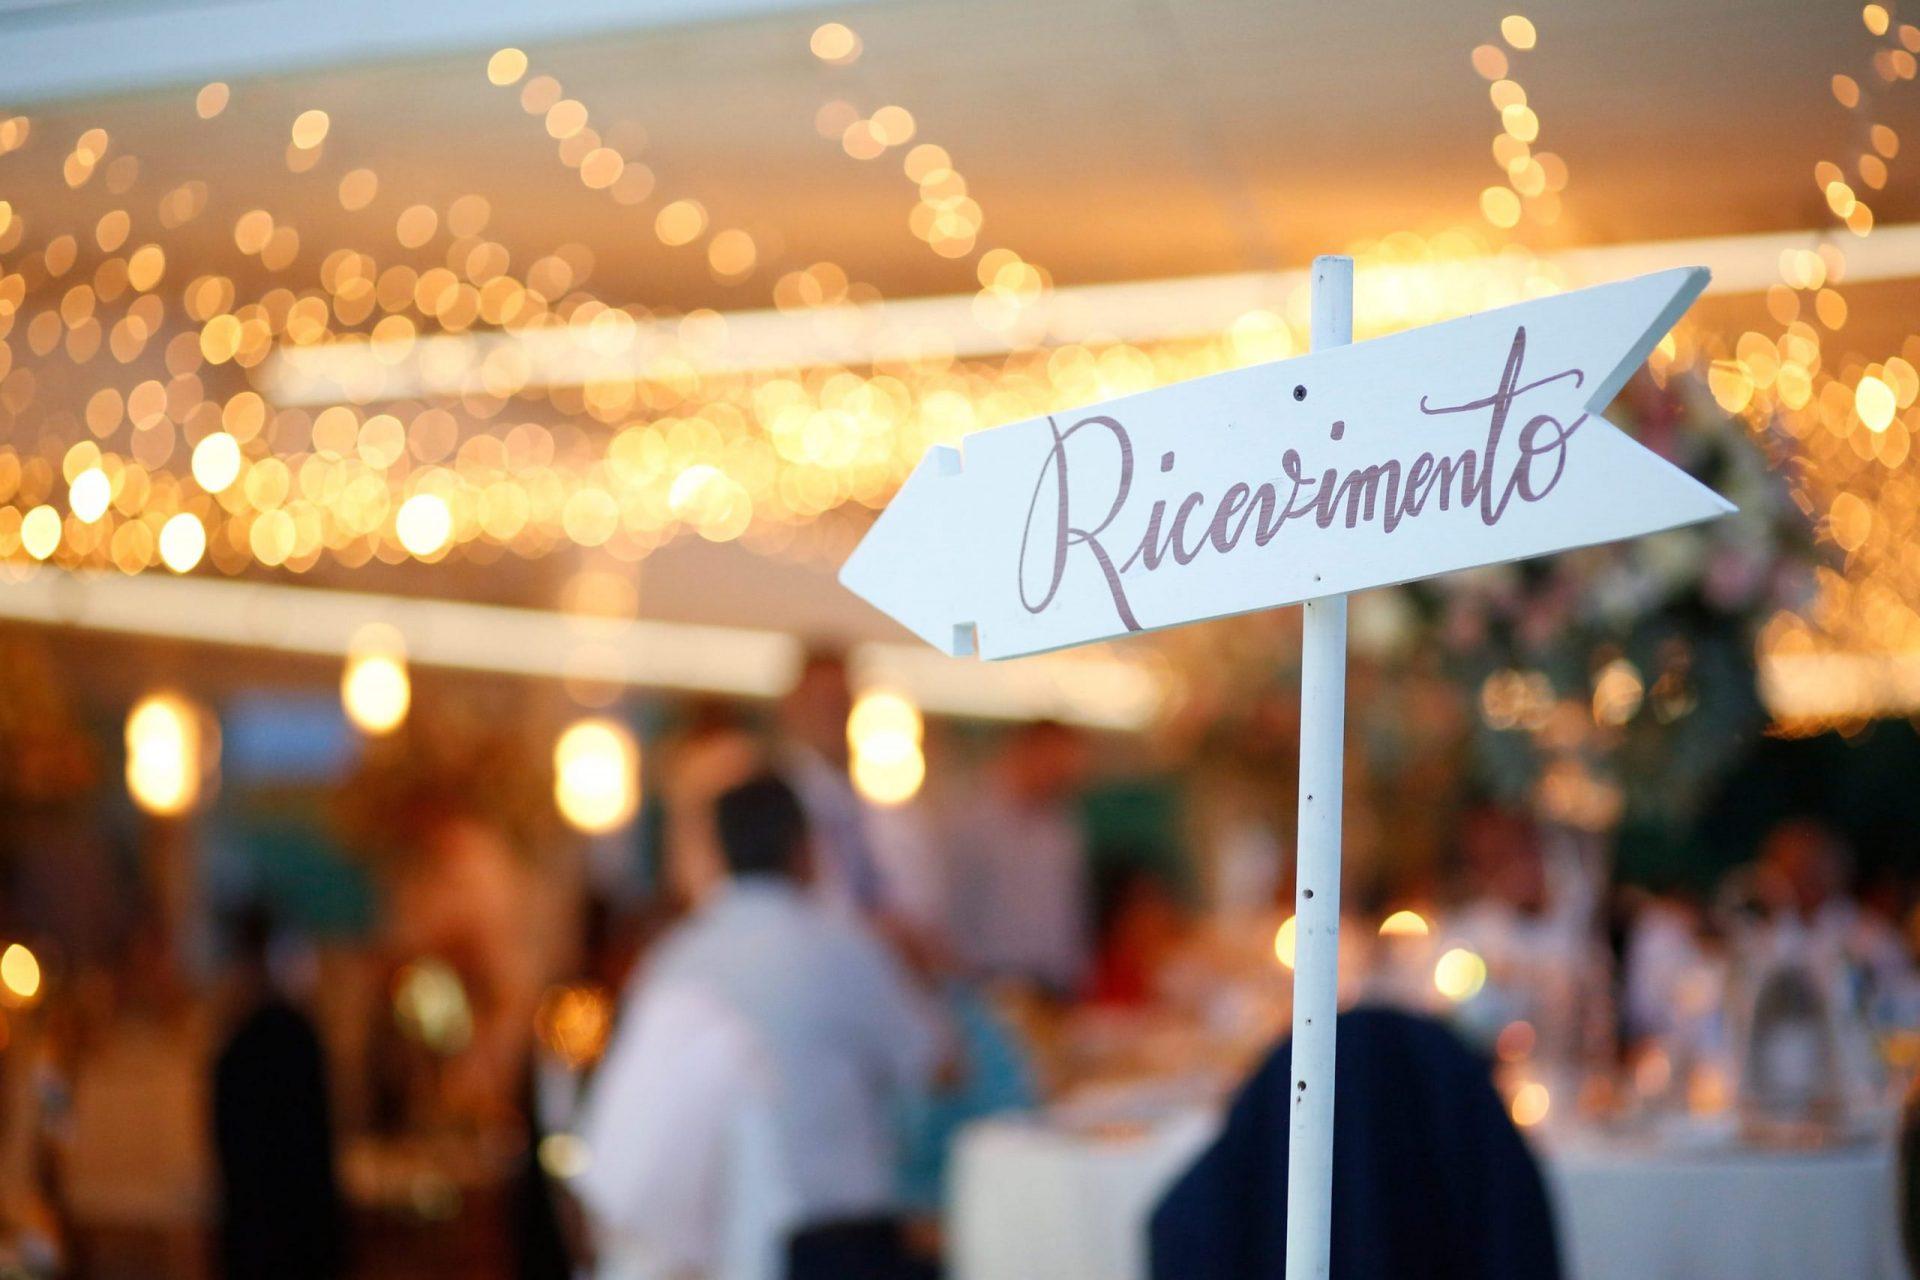 Enza e Samuele, wedding reception sign